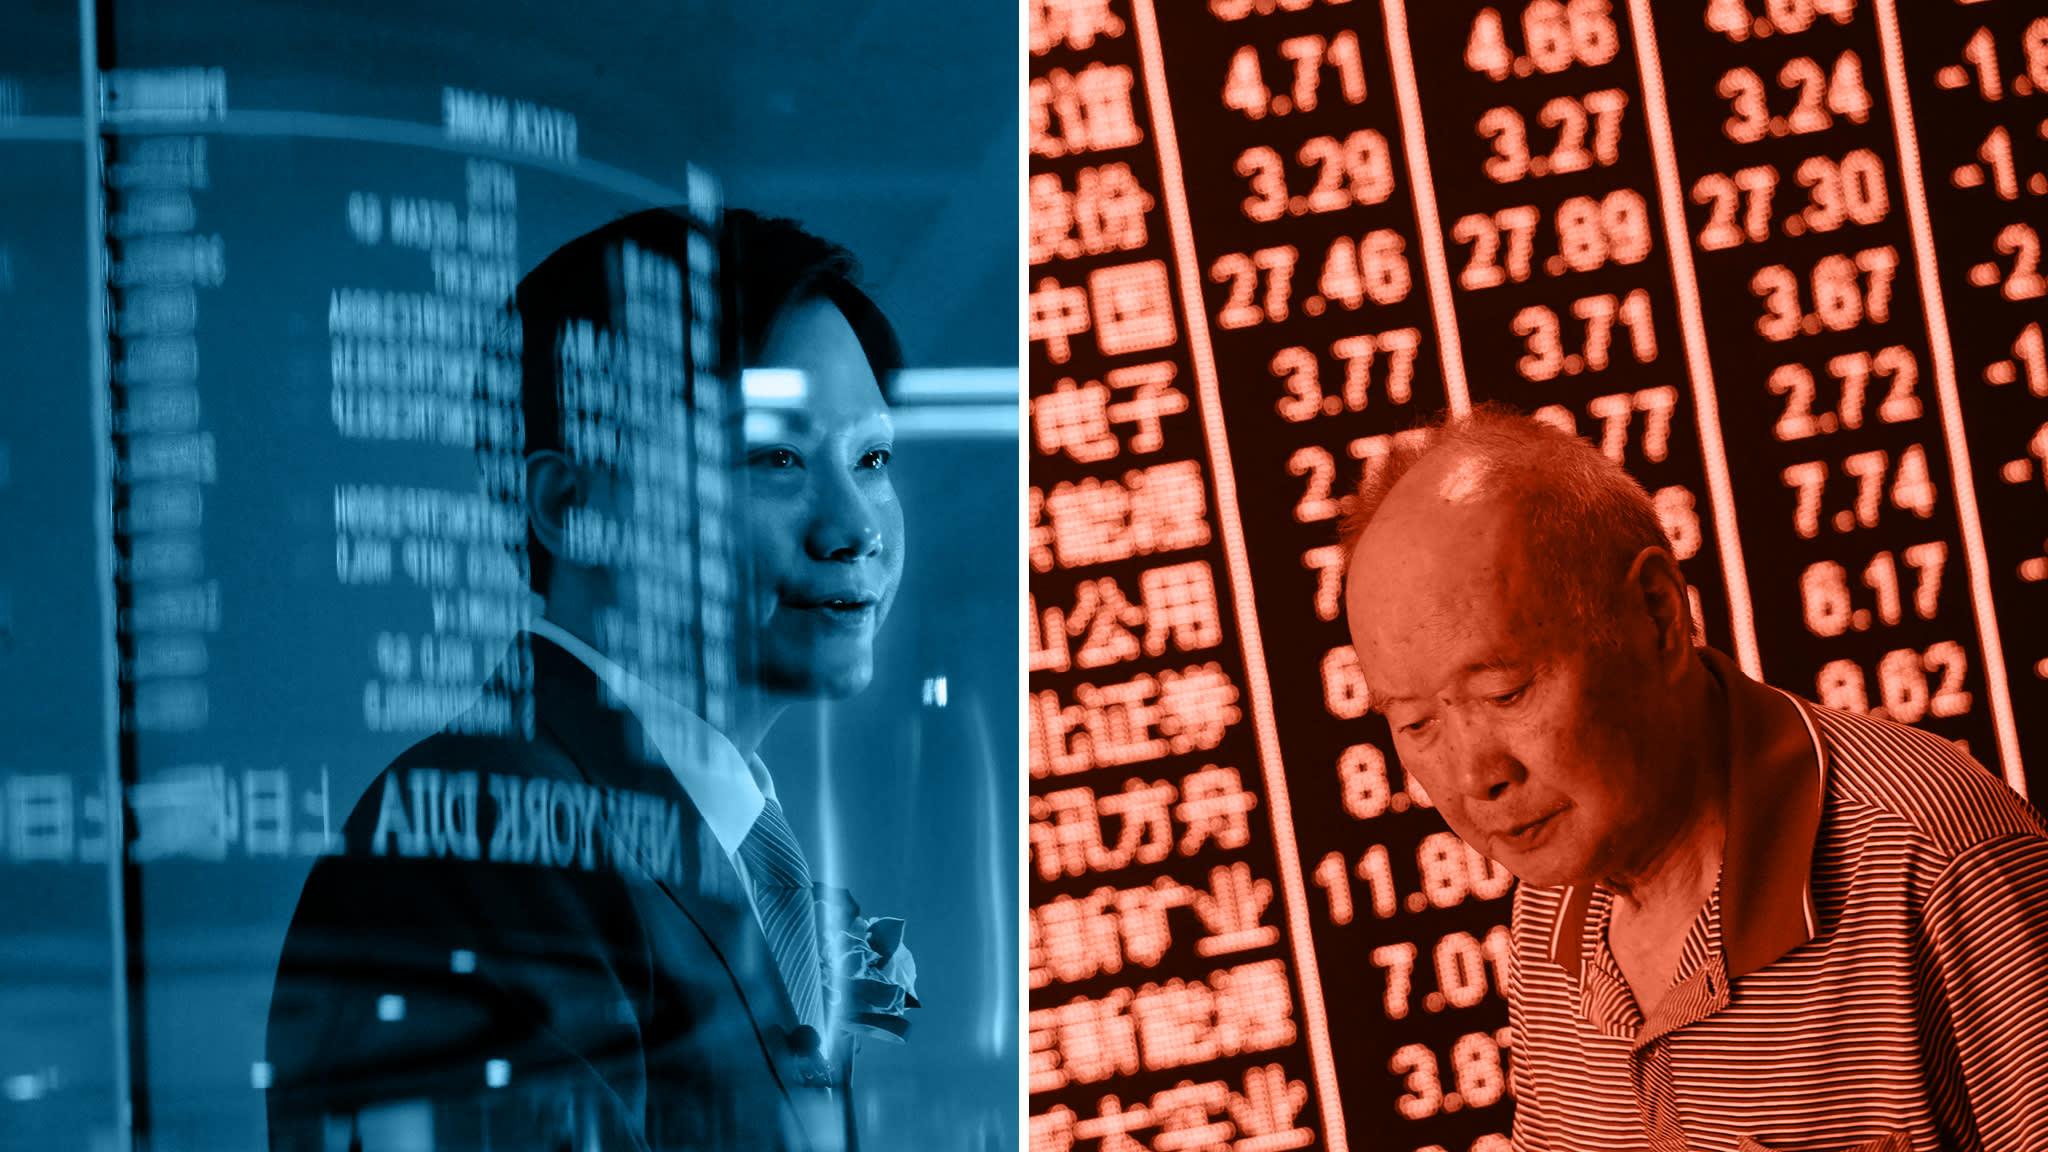 HK stock market enters bear territory amid EM sell-off